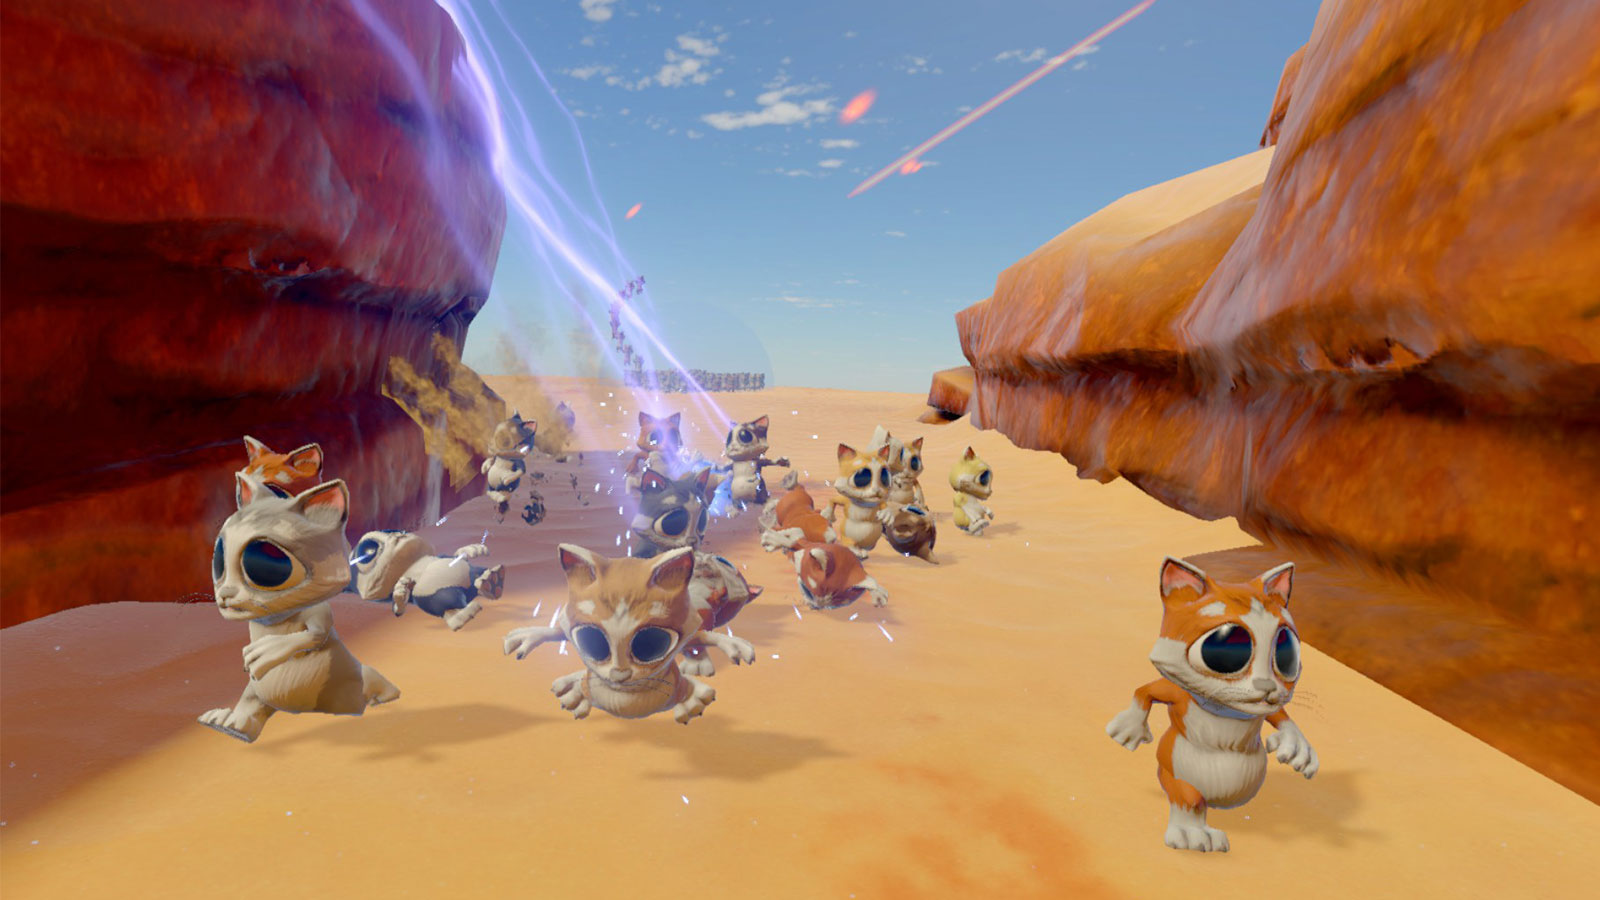 Hands on with kittie-killing VR game Kittypocalypse